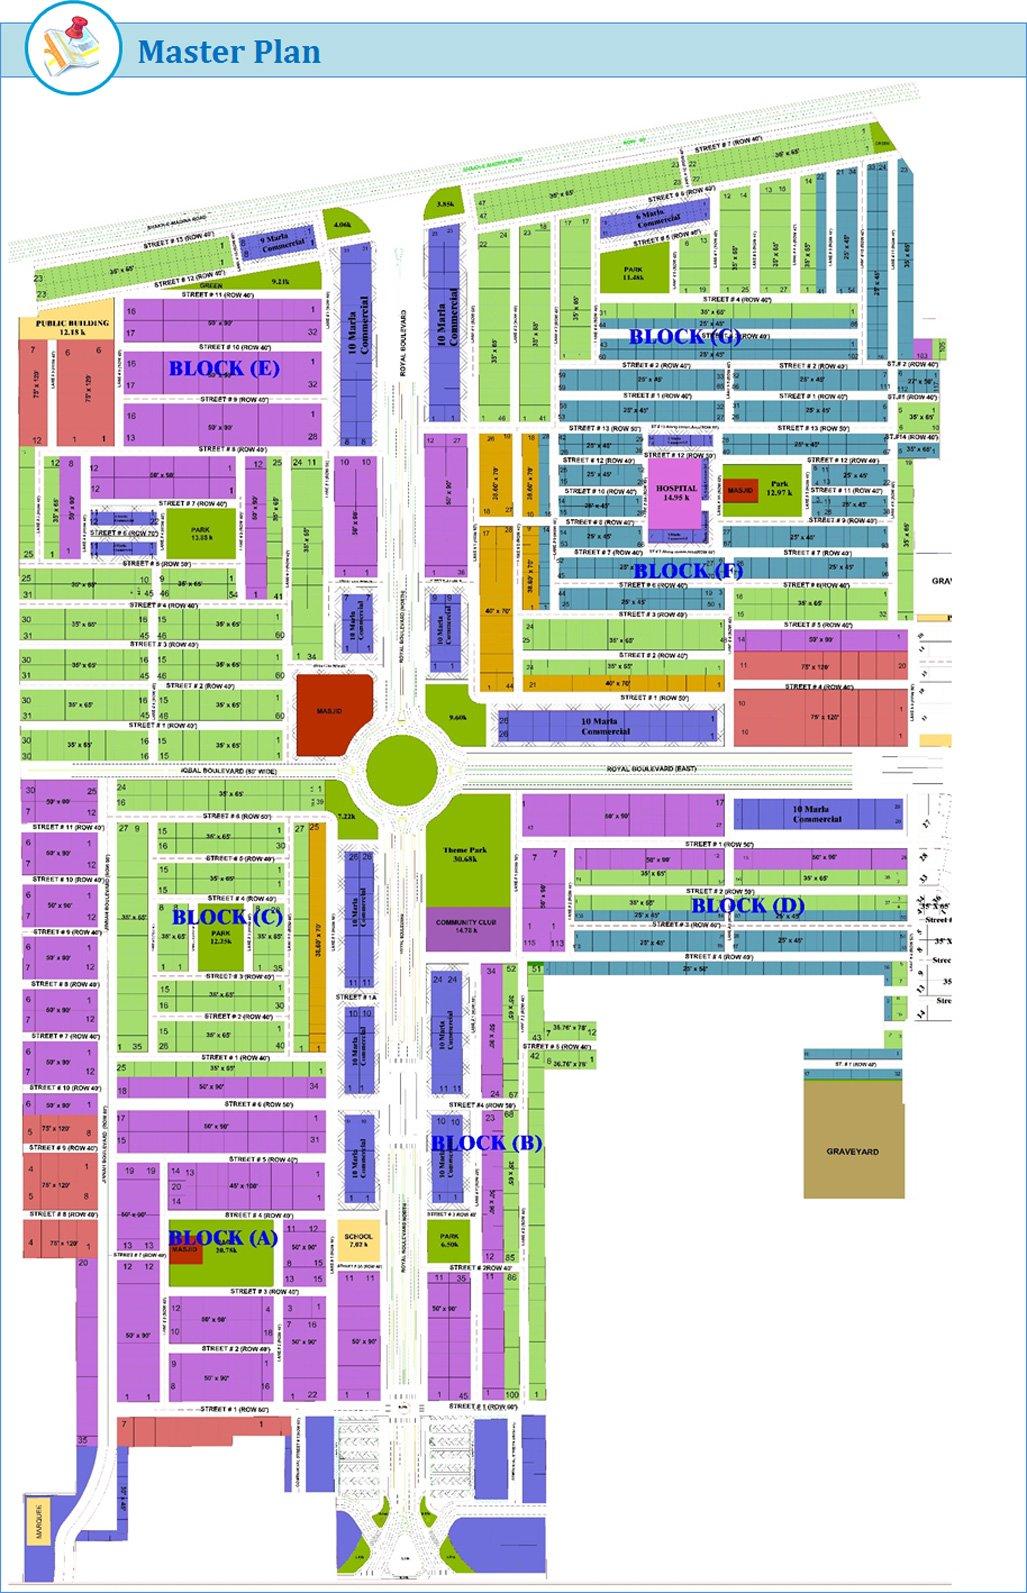 Master Plan - Royal Orchard